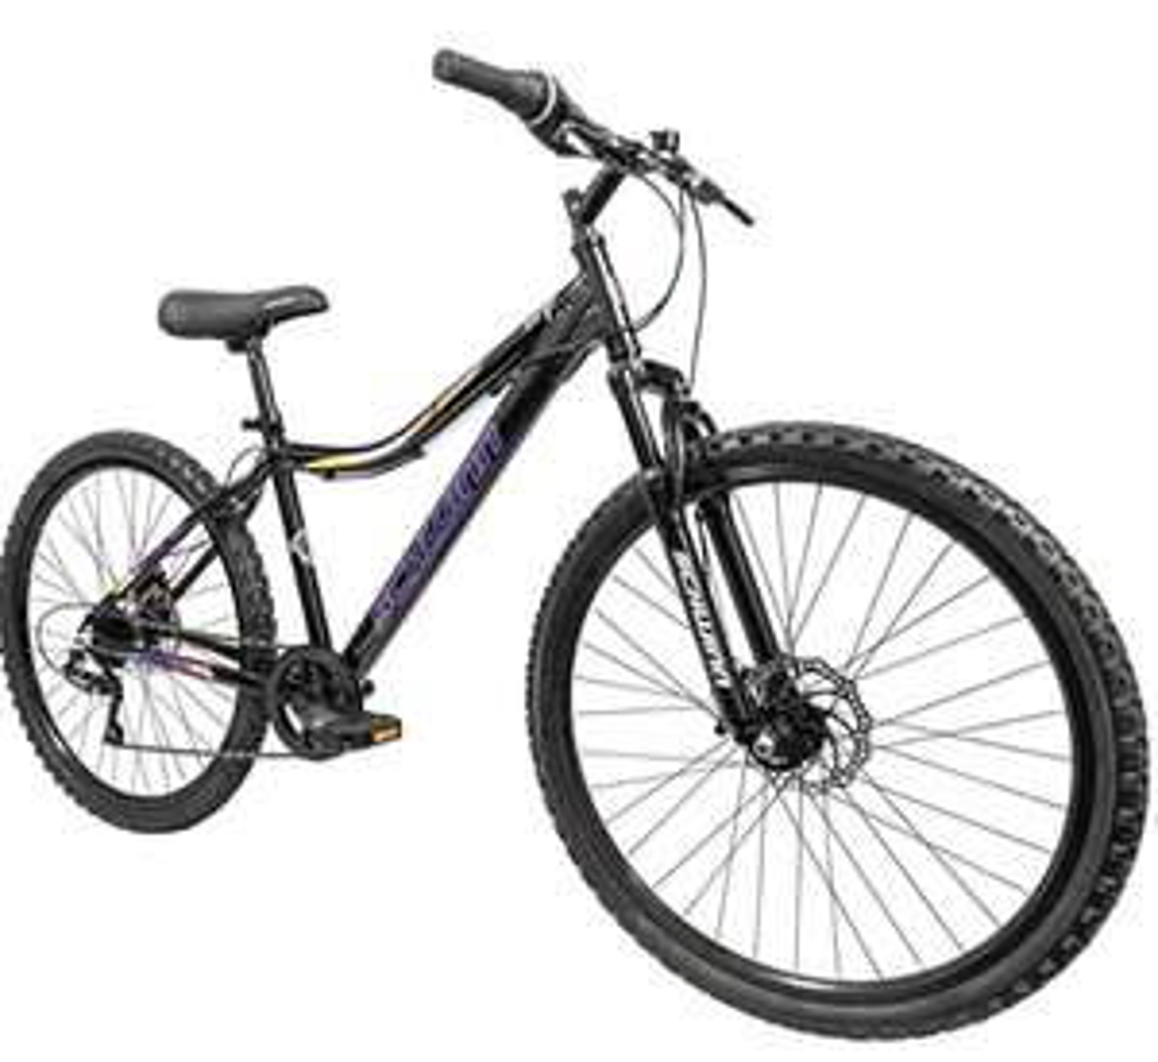 Adult Schwinn Surge Mountain Bike 26-Inch Wheels, Mens/Womens 17-Inch Alloy Frame, 7 Speed, Disc Brakes - £152.84 @ Amazon